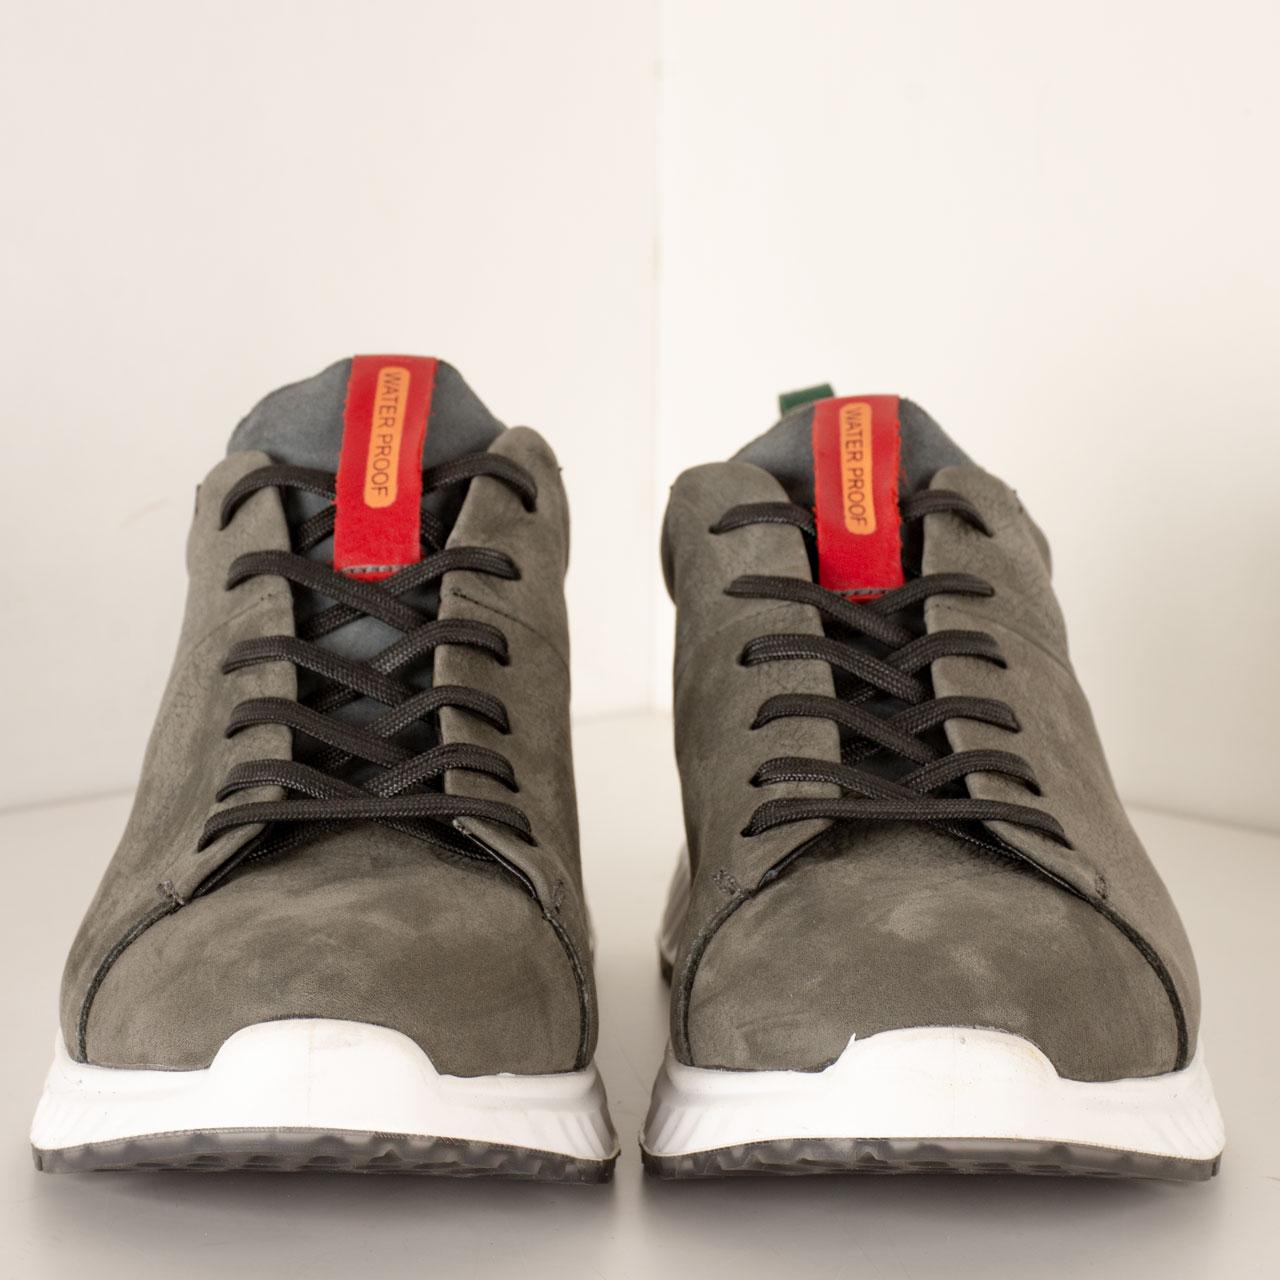 PARINECHARM leather men's casual shoes , SHO217-3 Model